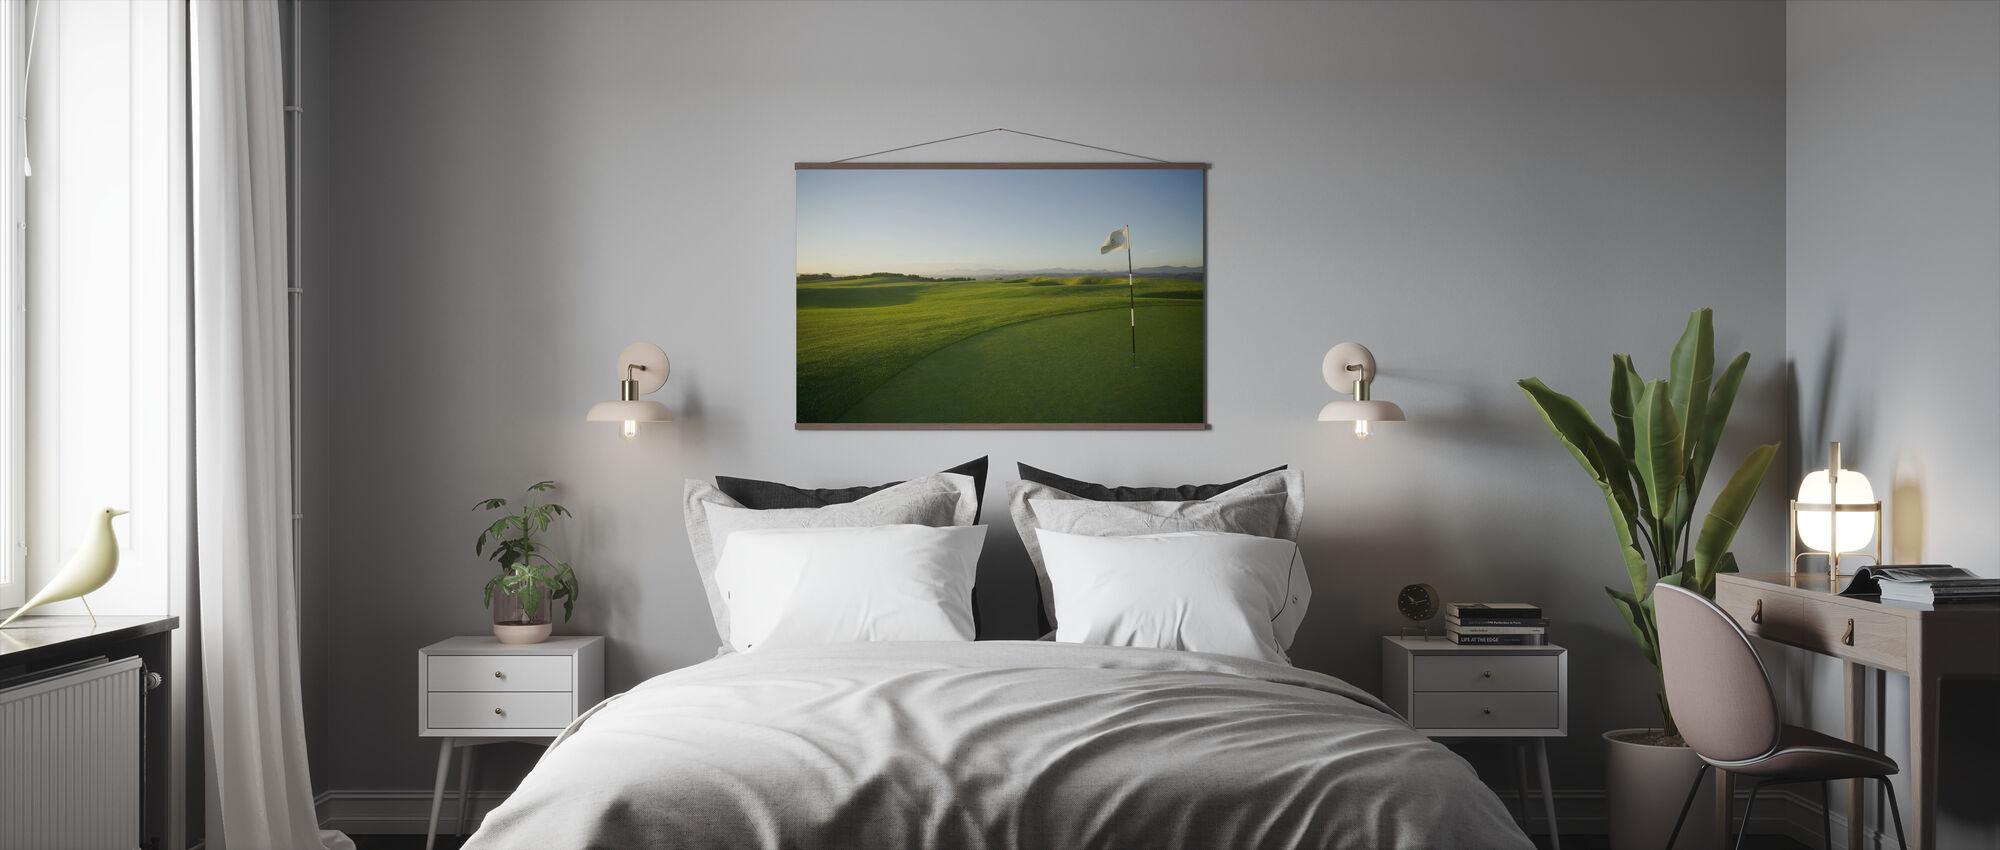 Zuid-Afrikaanse golfbaan - Poster - Slaapkamer